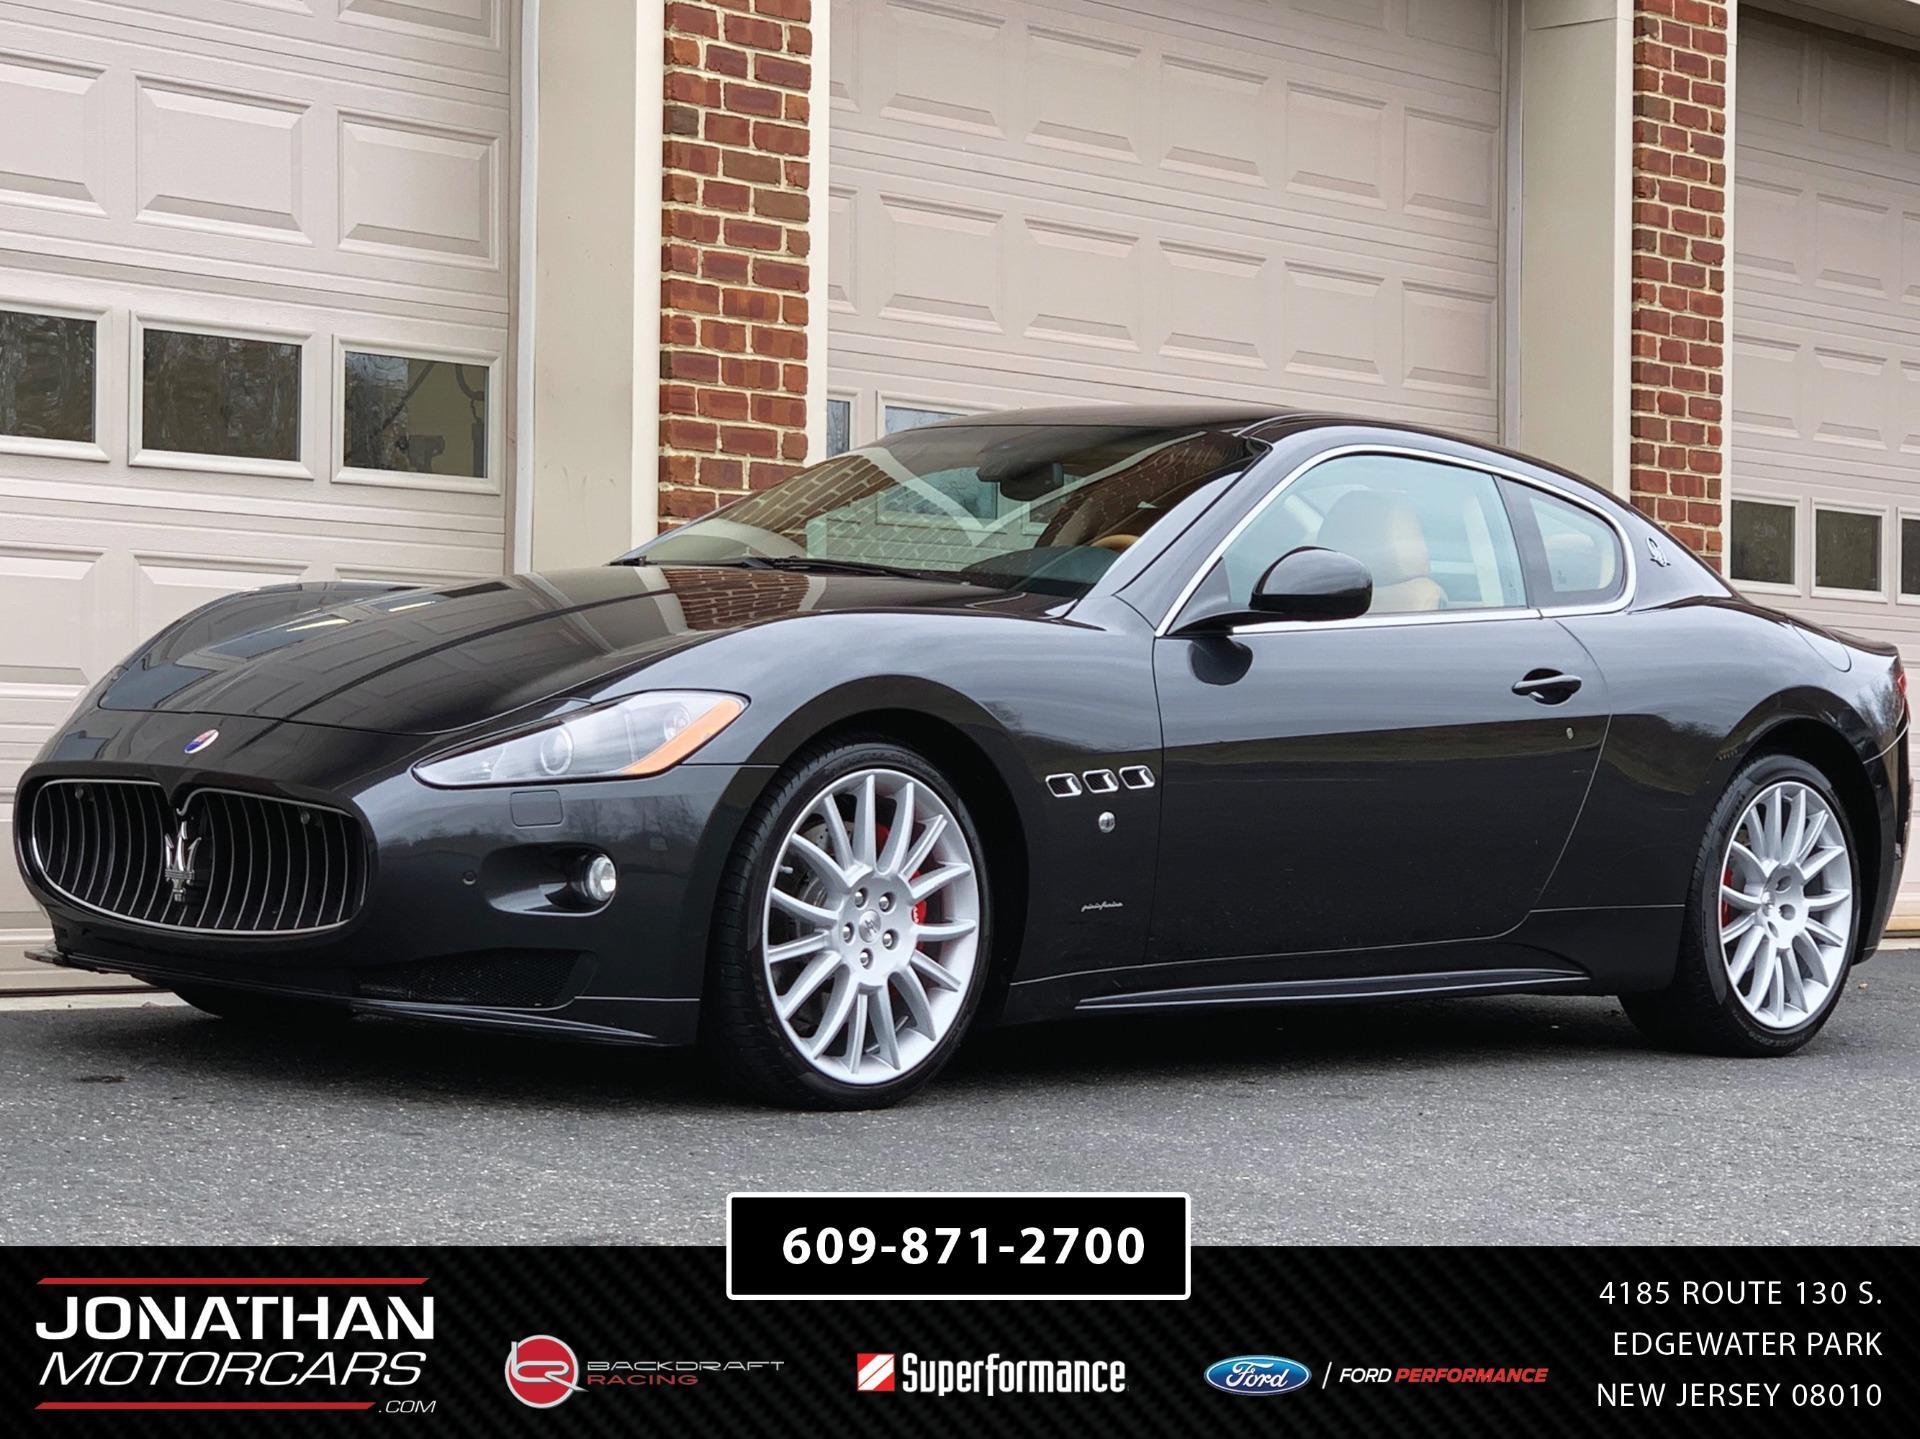 Used 2011 Maserati GranTurismo S Coupe | Edgewater Park, NJ